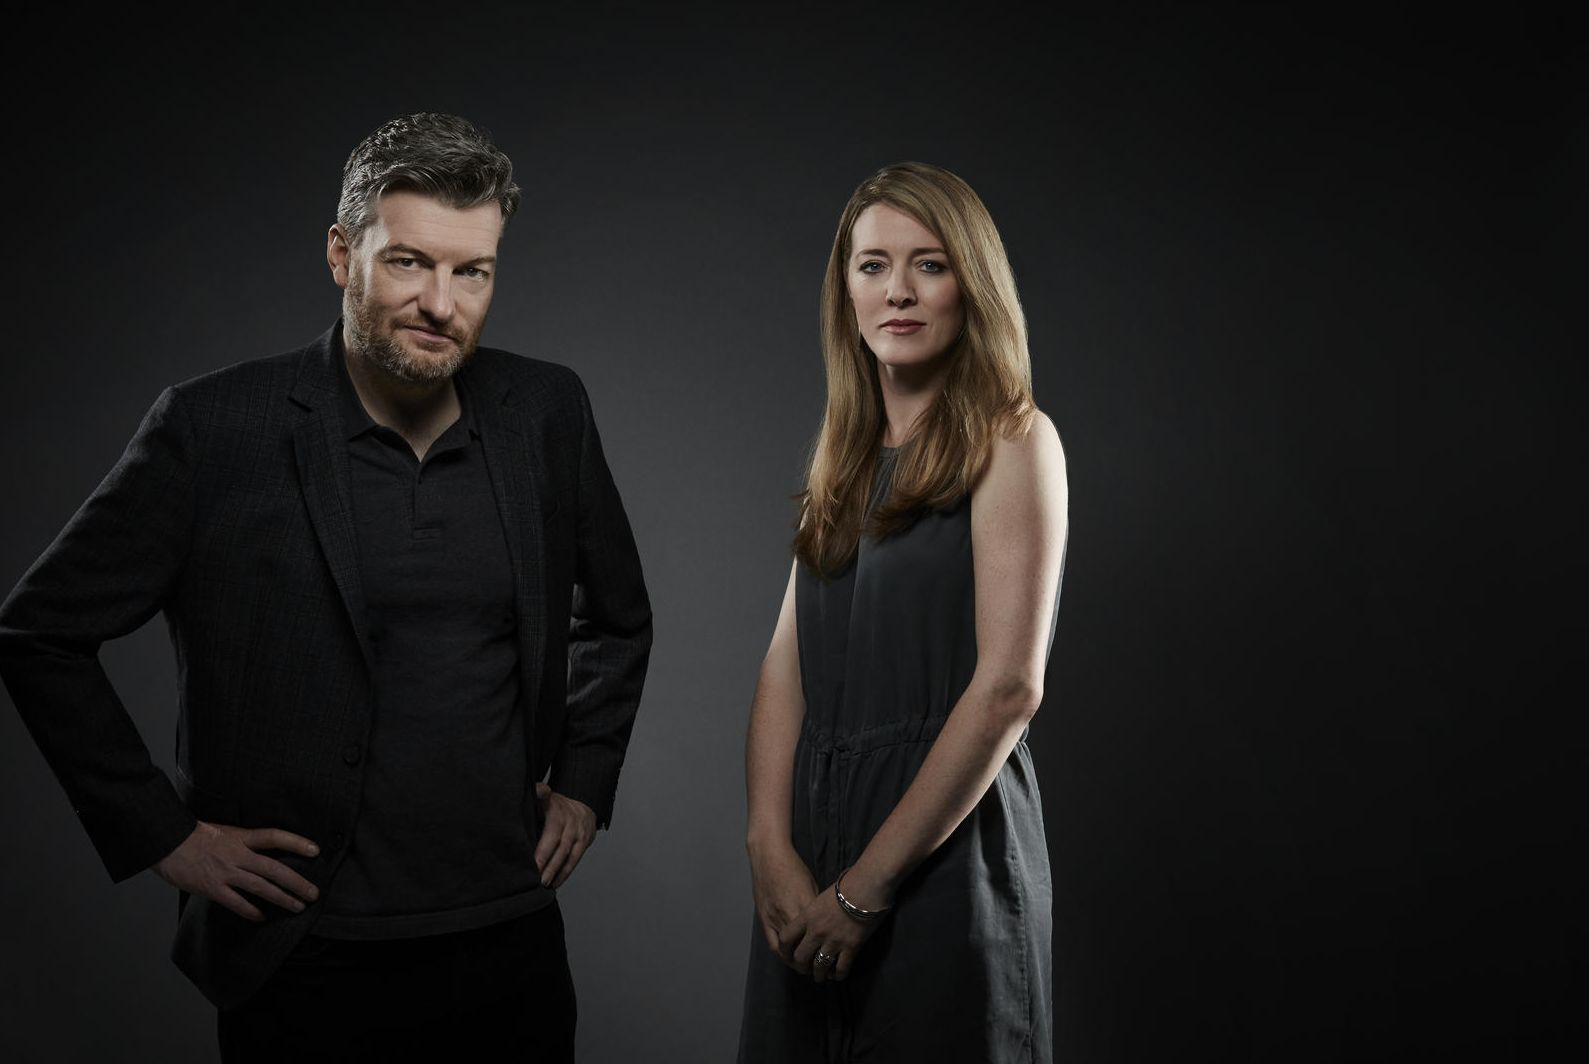 'Black Mirror' Creators Charlie Brooker And Annabel Jones Take On 'Bandersnatch'